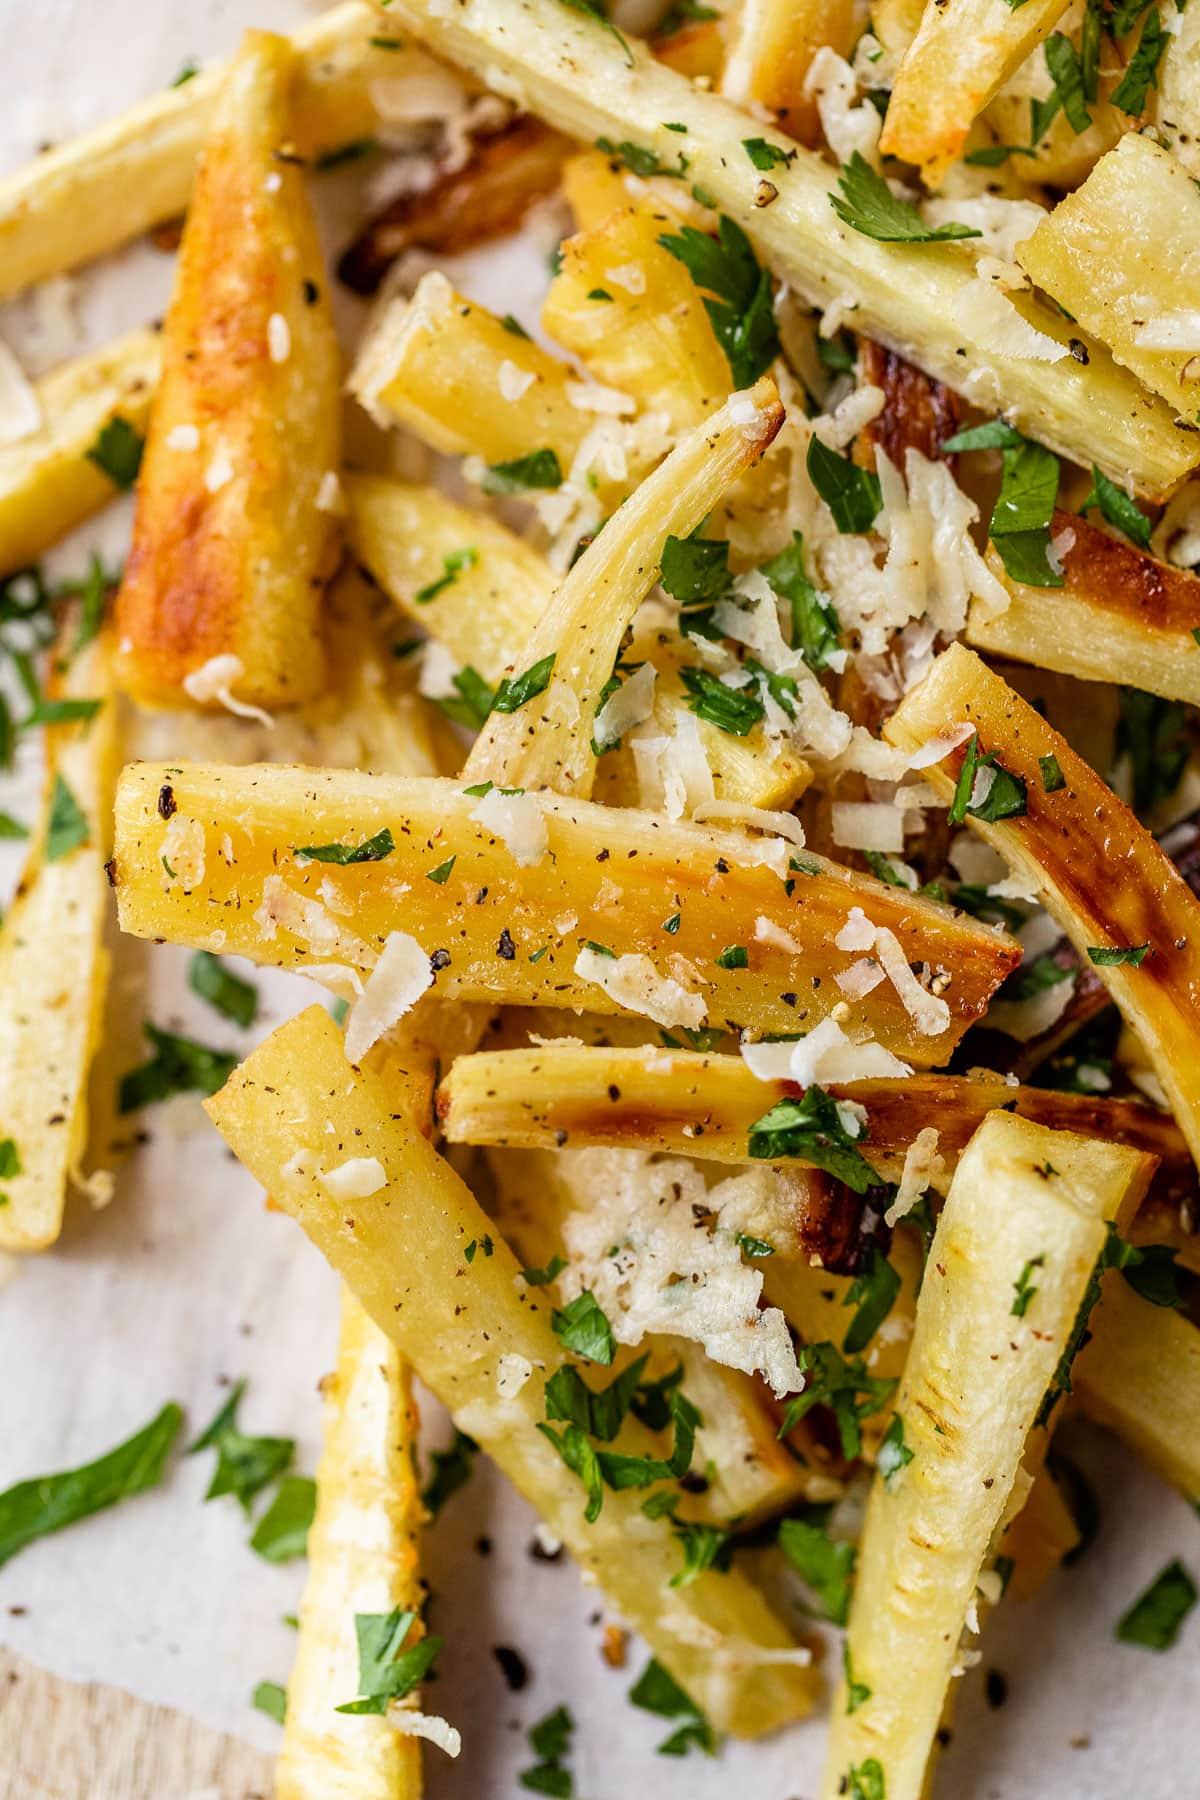 Baked Parmesan Parsnip Fries